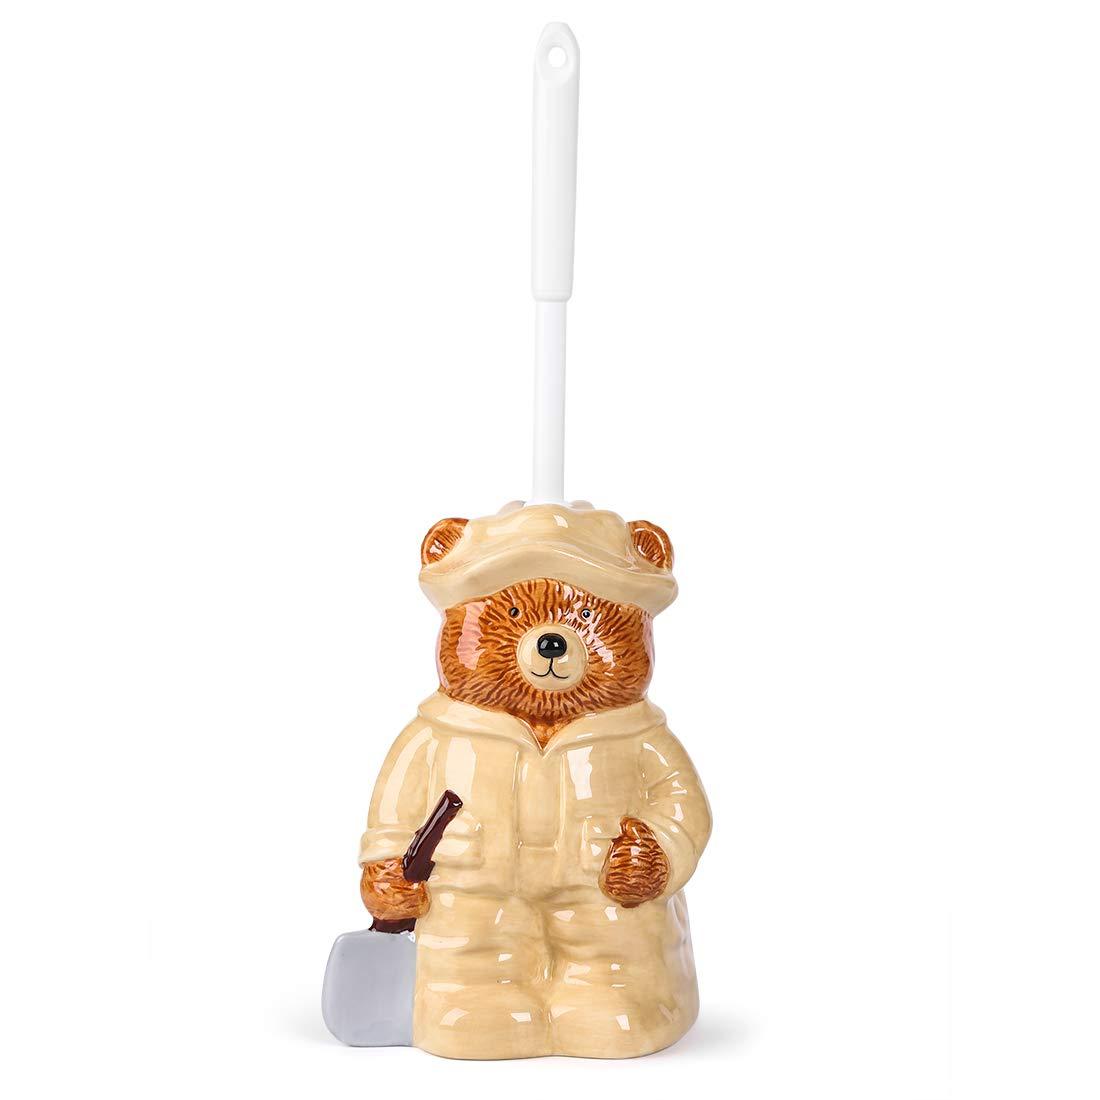 FORLONG Ceramic Toilet Brush Holder Set, Creative and Cute Bear Father Brush Cleaner Holder Including Brush for Bathroom